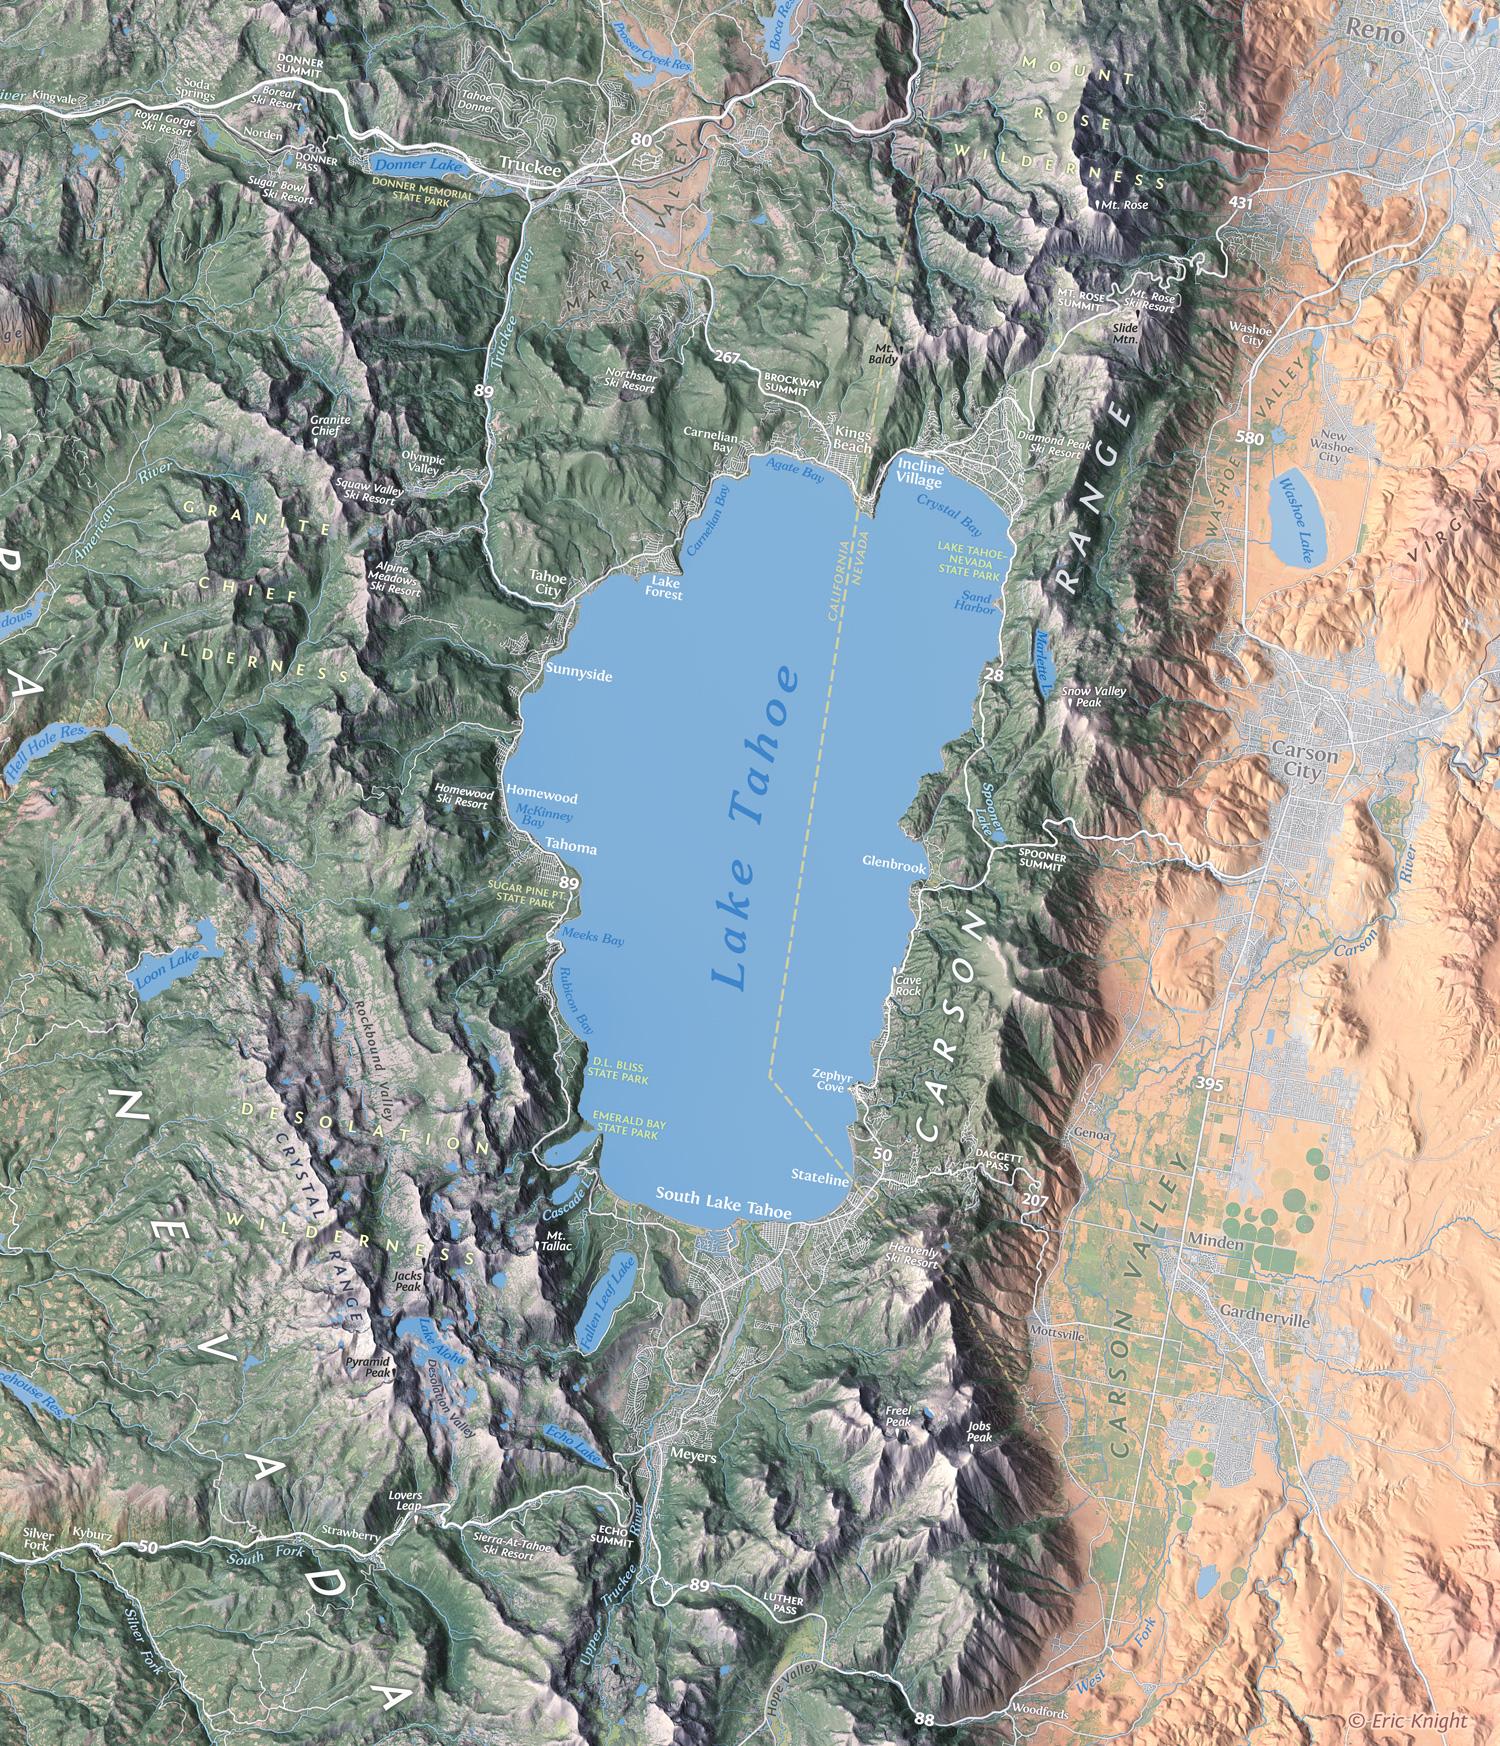 EricKnight-Tahoe-planimetric-detail-1500px.jpg